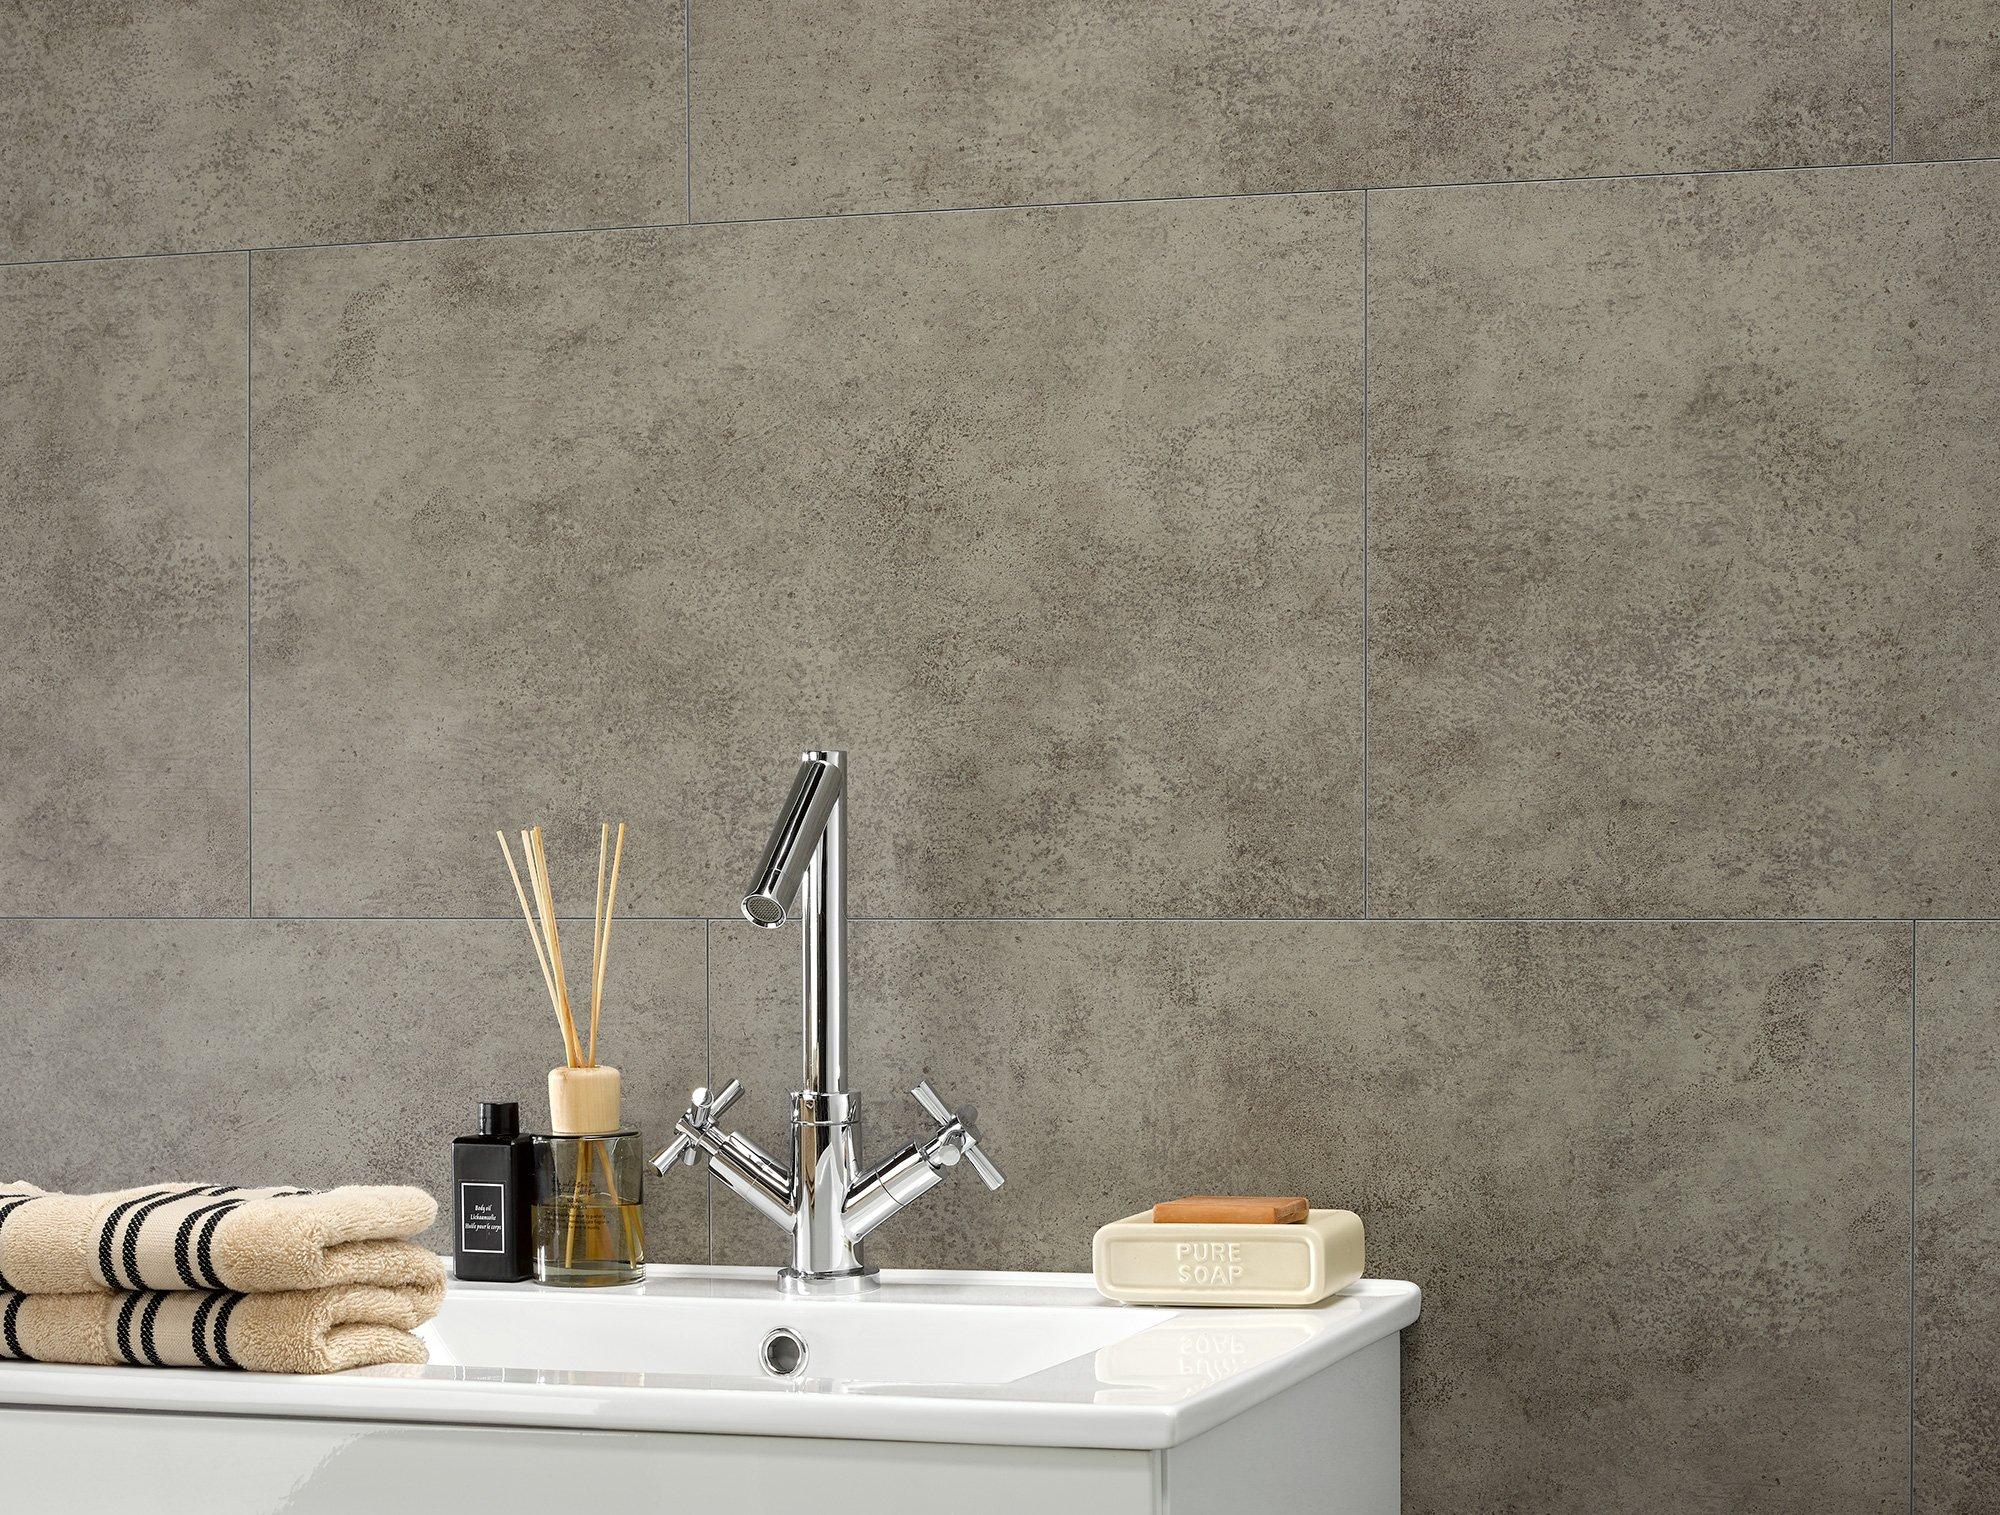 Bathroom Cladding Direct | Bathroom Cladding Direct